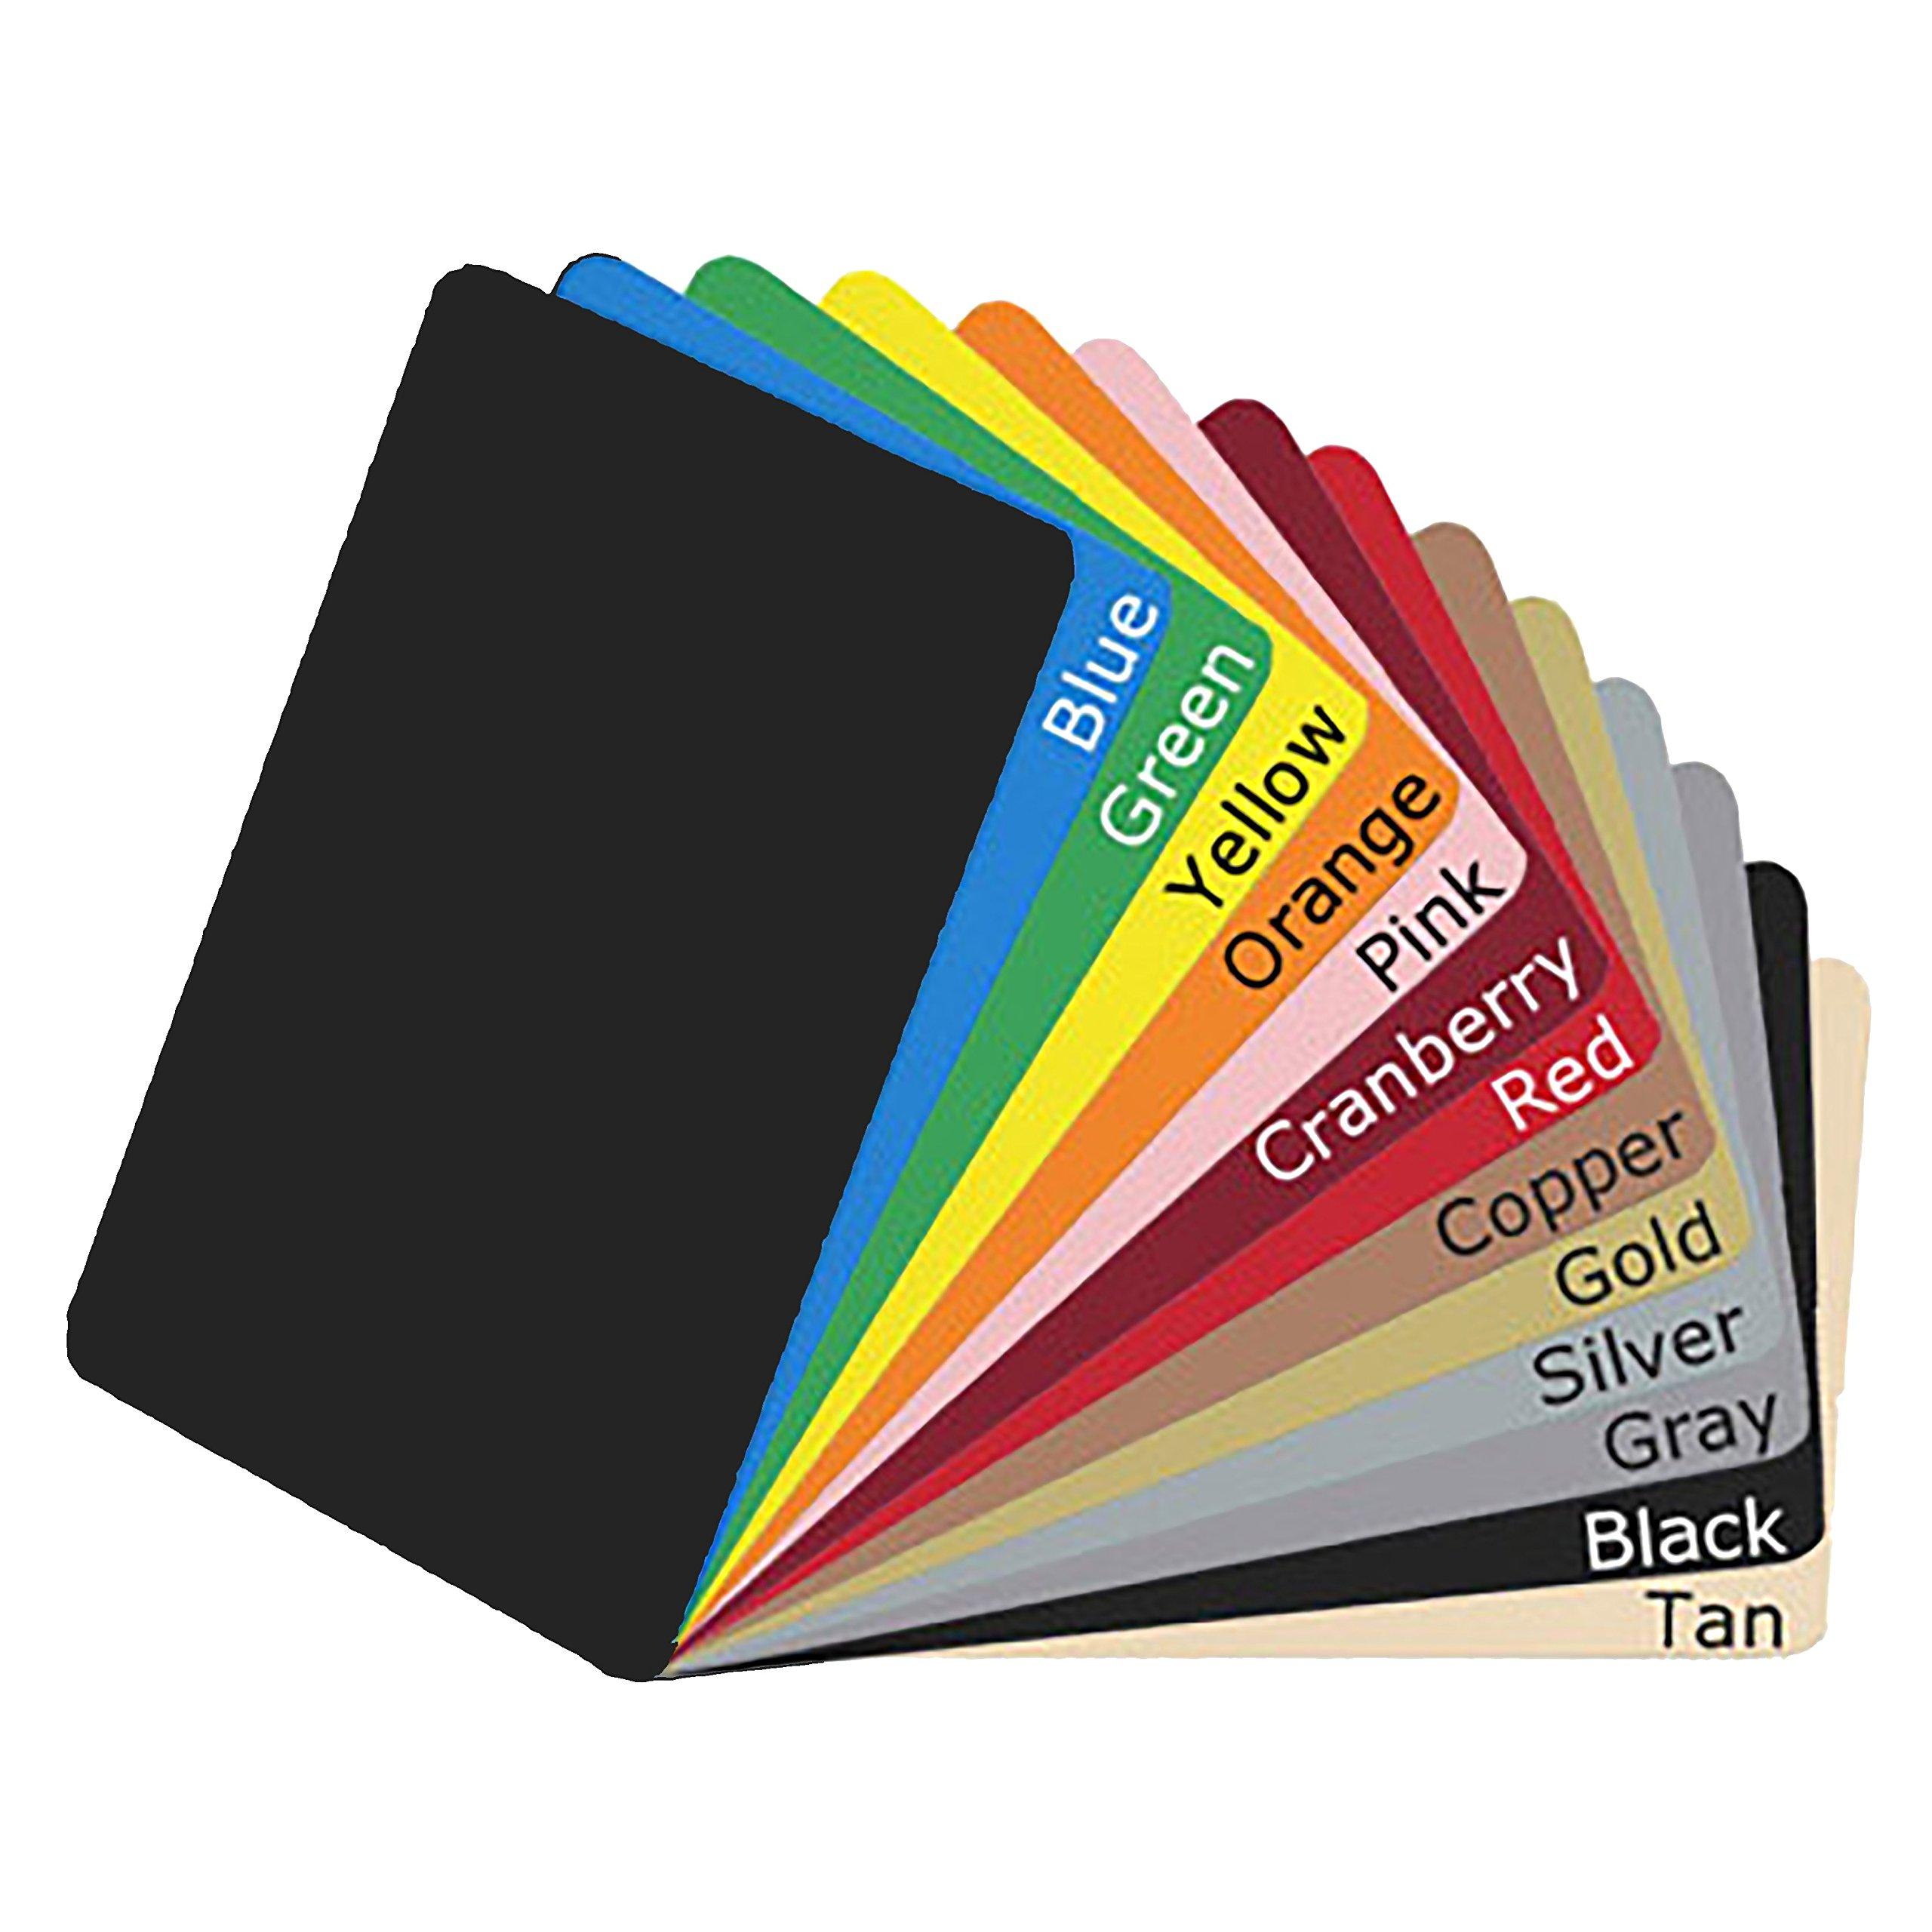 100 Black CR80 HiCo PVC Magnetic Stripe Cards -POS-Depot Brand Cards